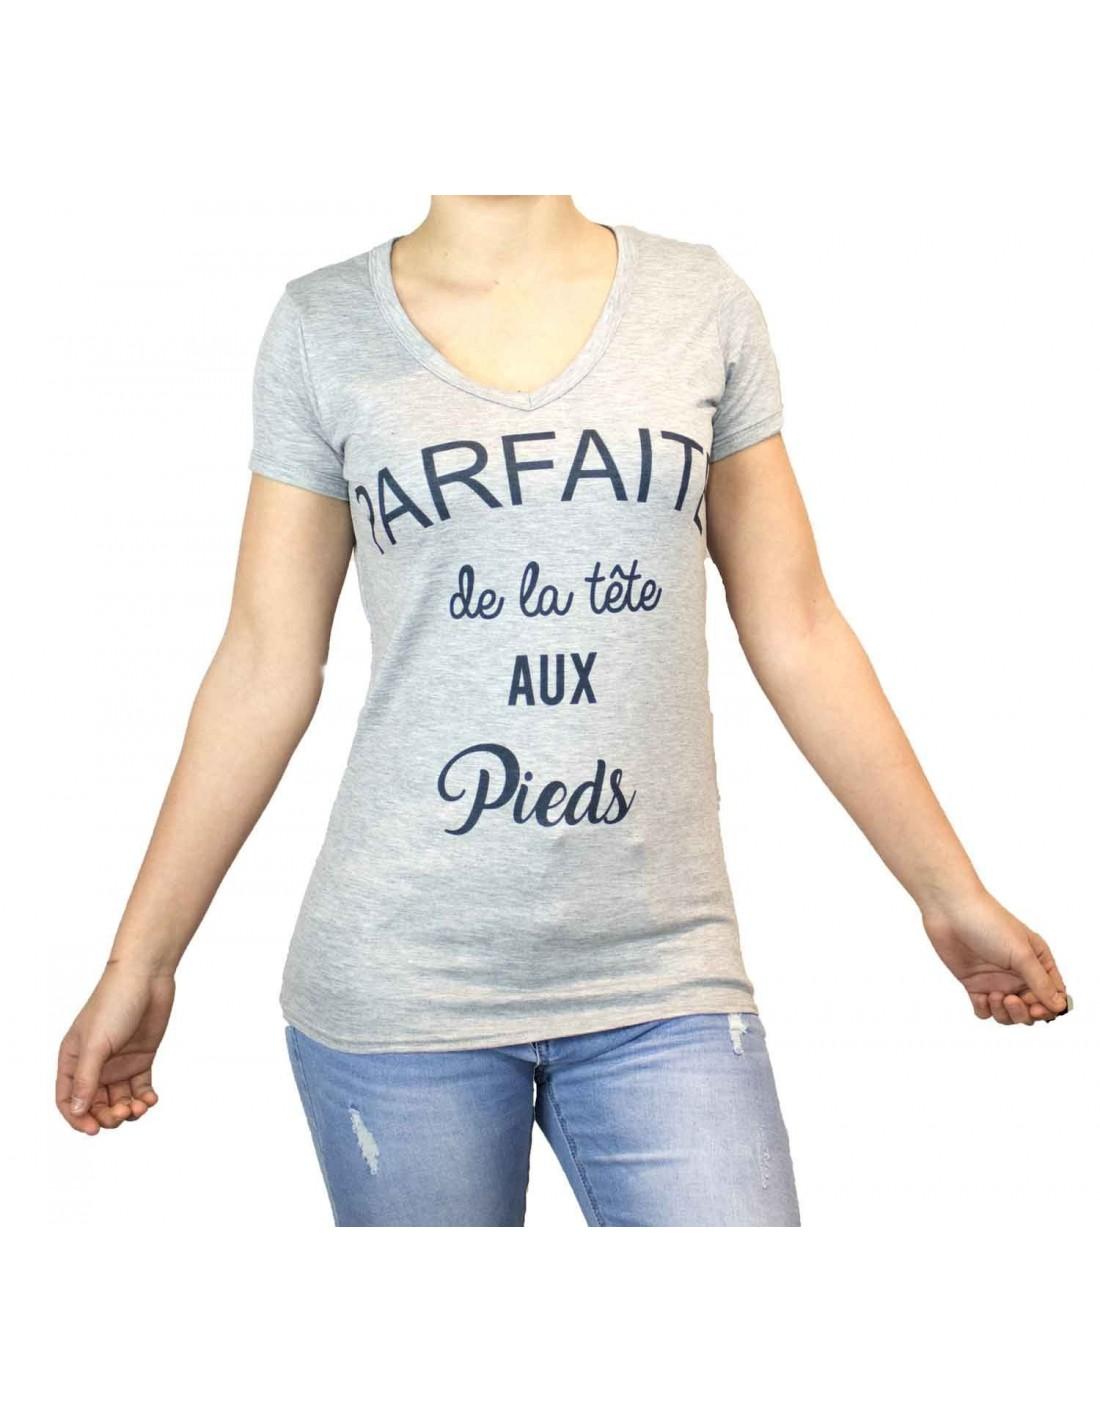 chistosa de mujer Aqw1c1 humor Camiseta de de Ropa embarazo Camisa XZkwiuTPO